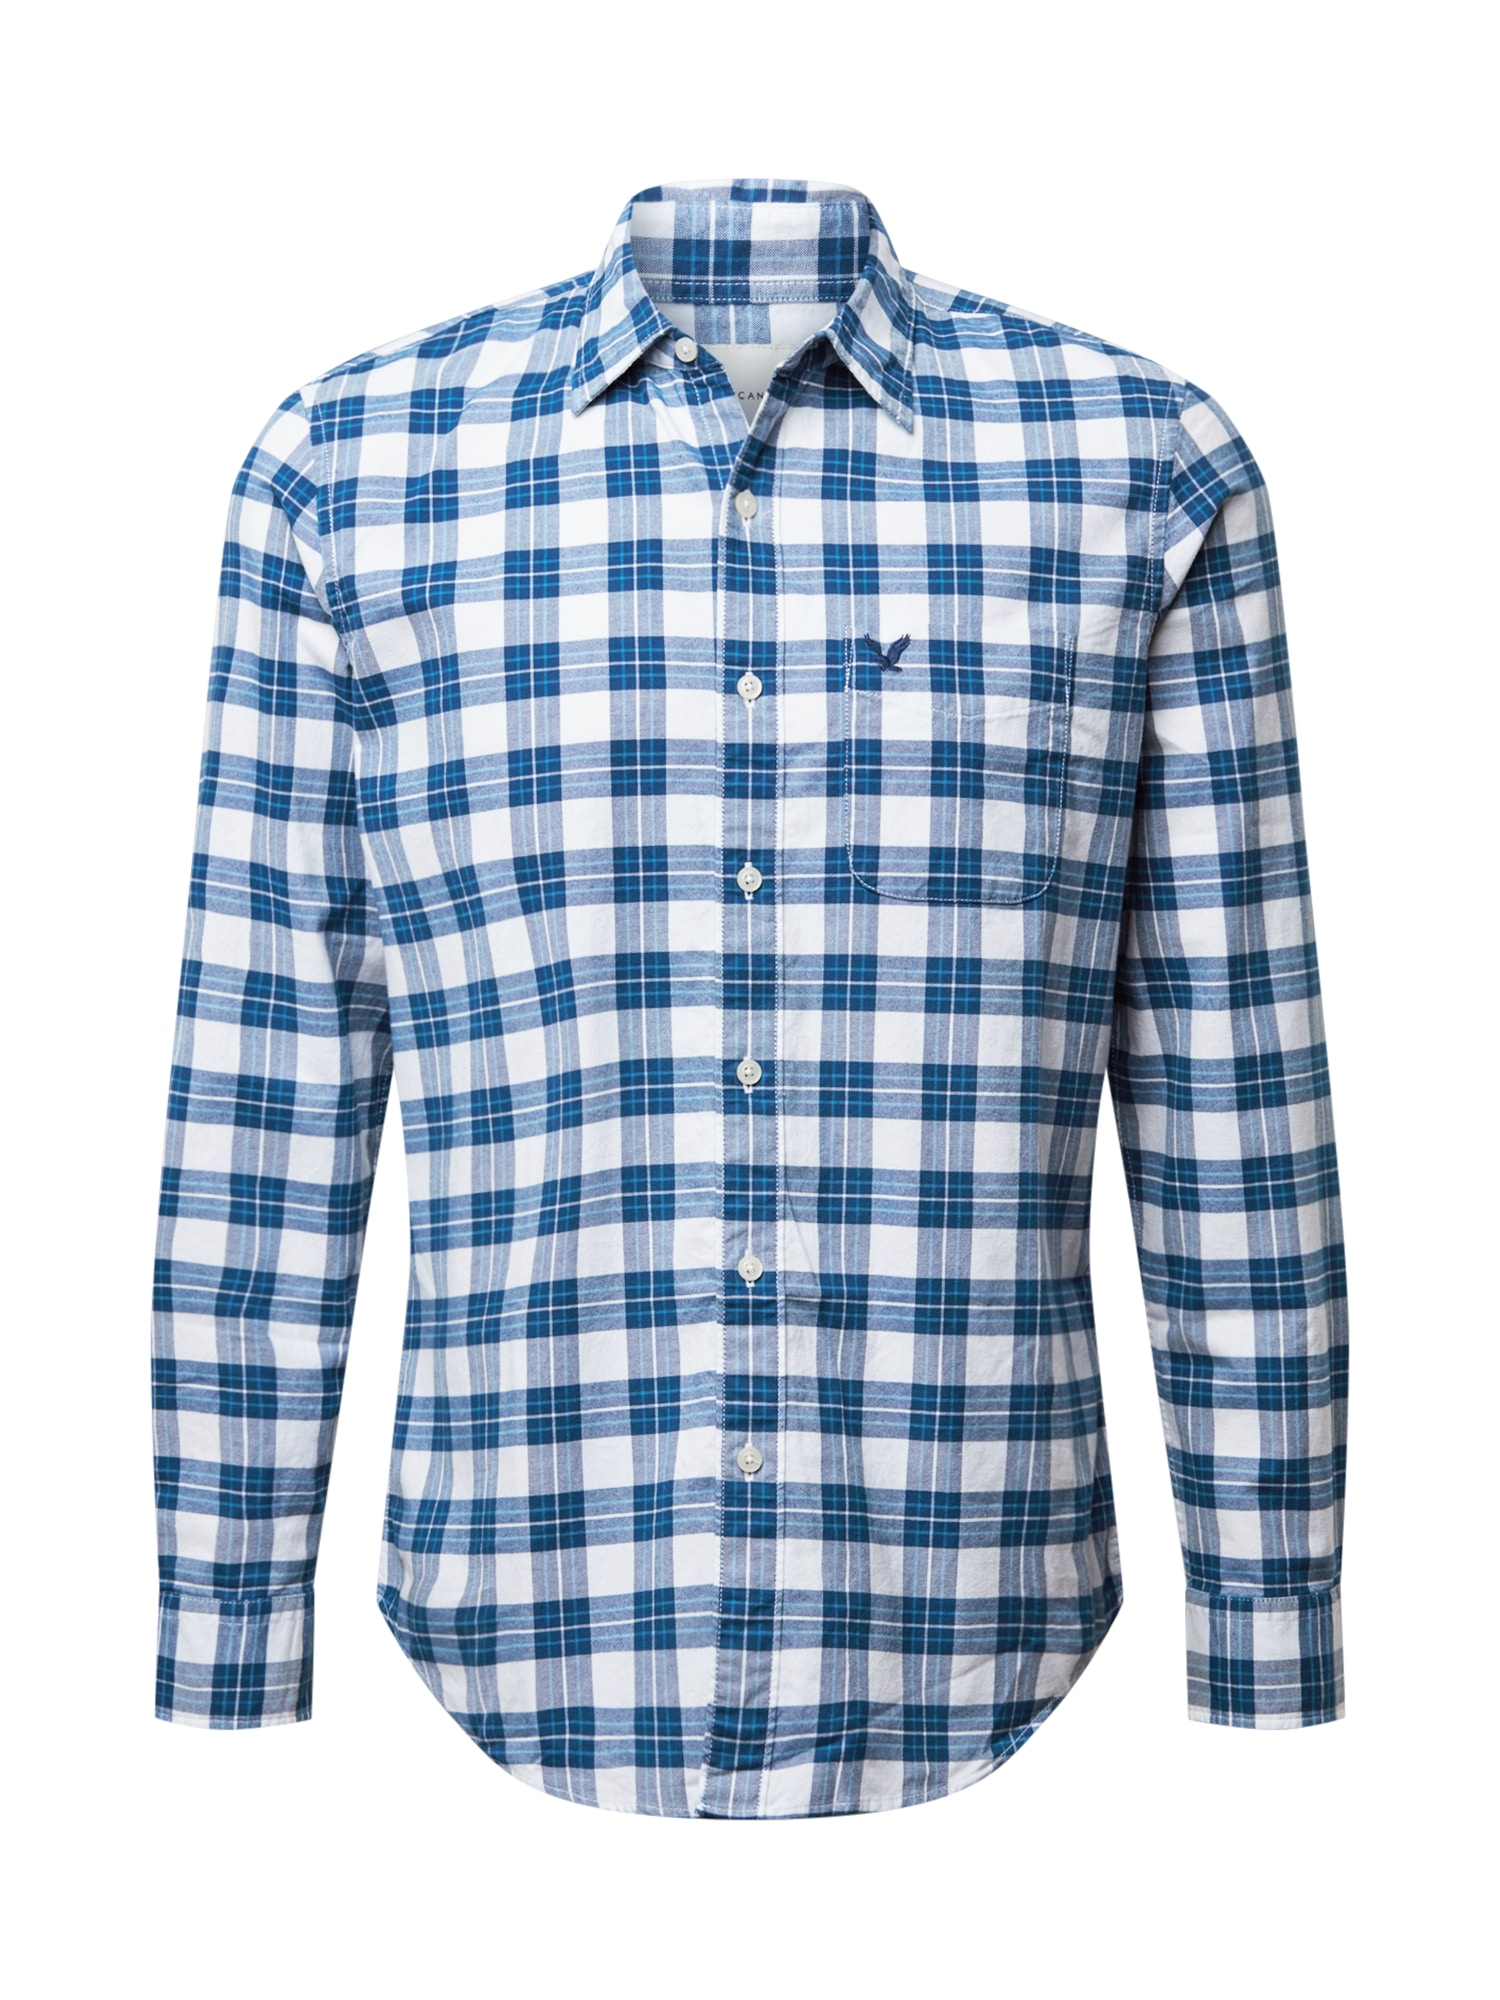 American Eagle Košile  modrá / bílá